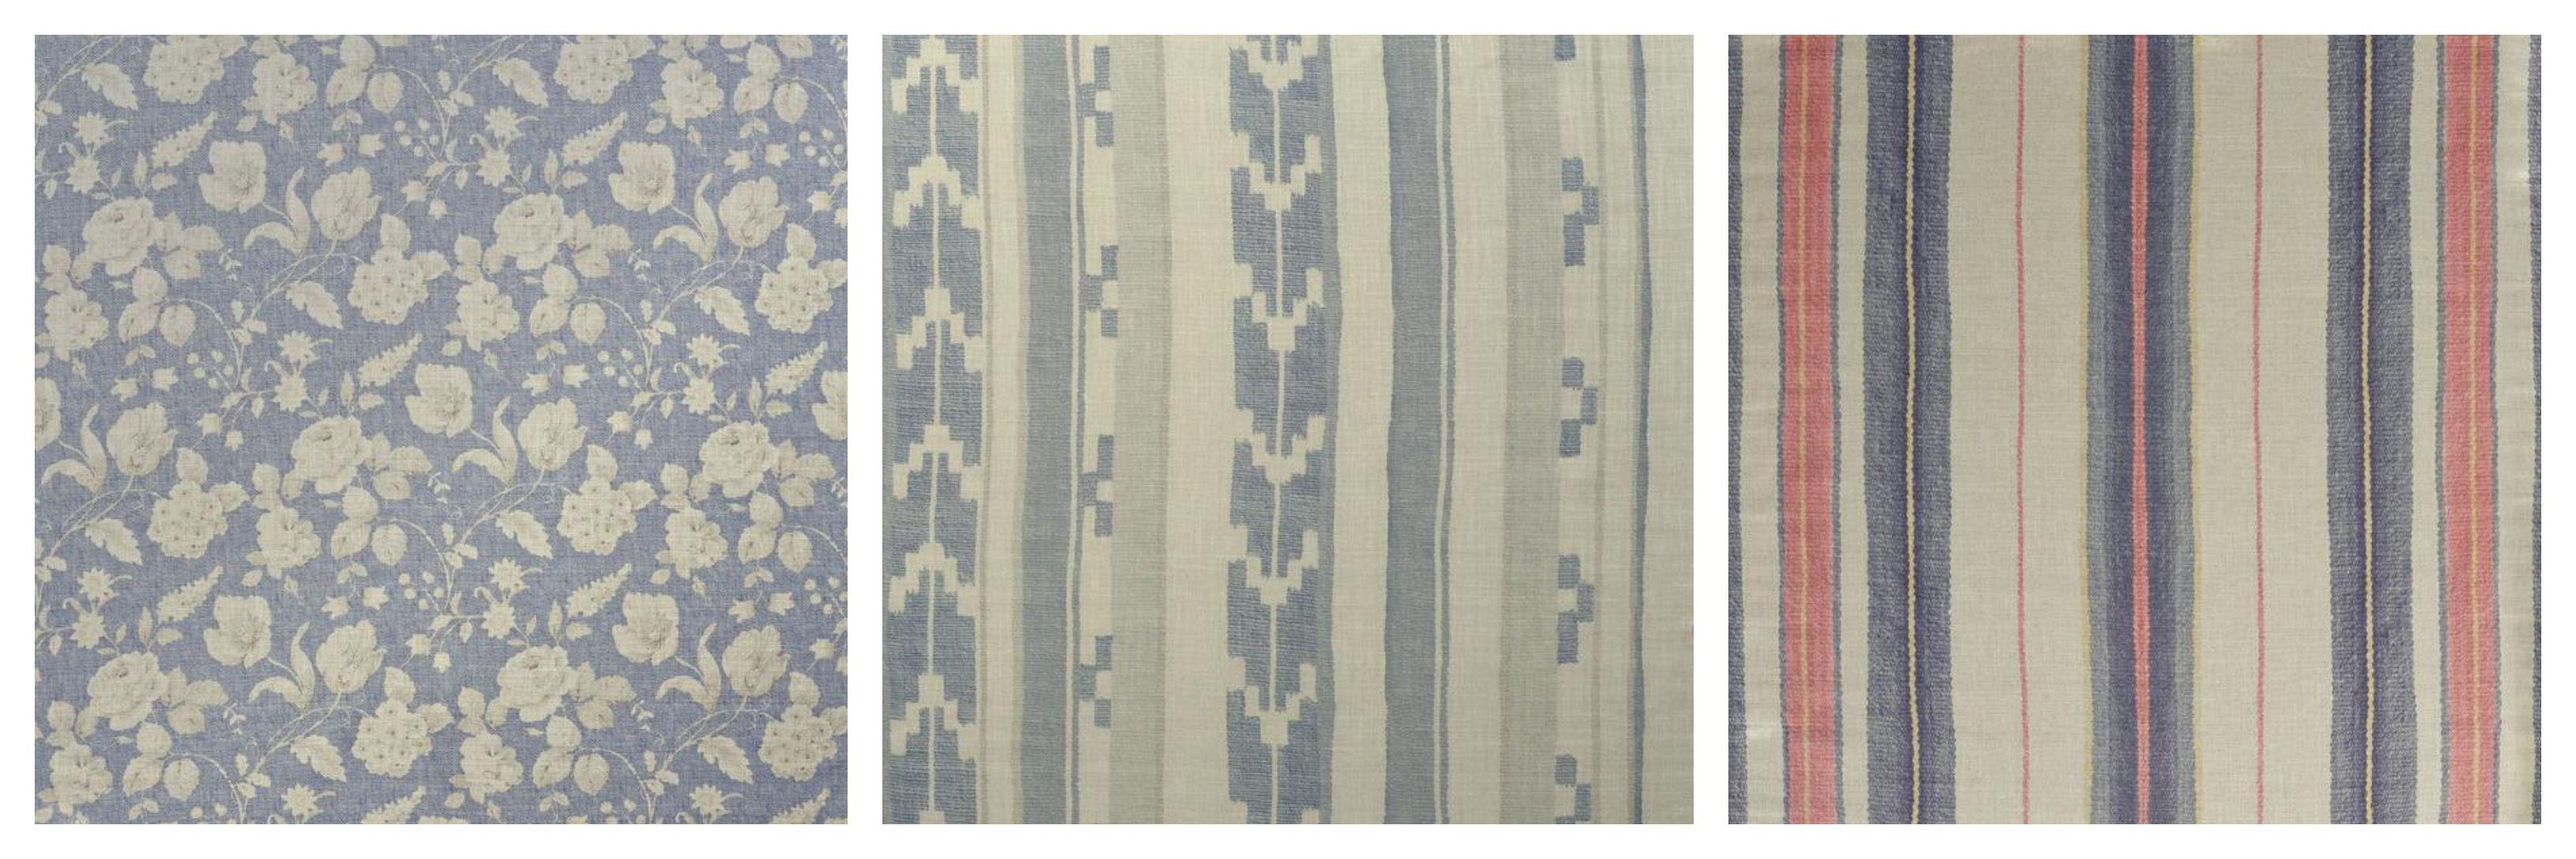 Narikala, Indus, & Elbrus fabrics by Andrew Martin